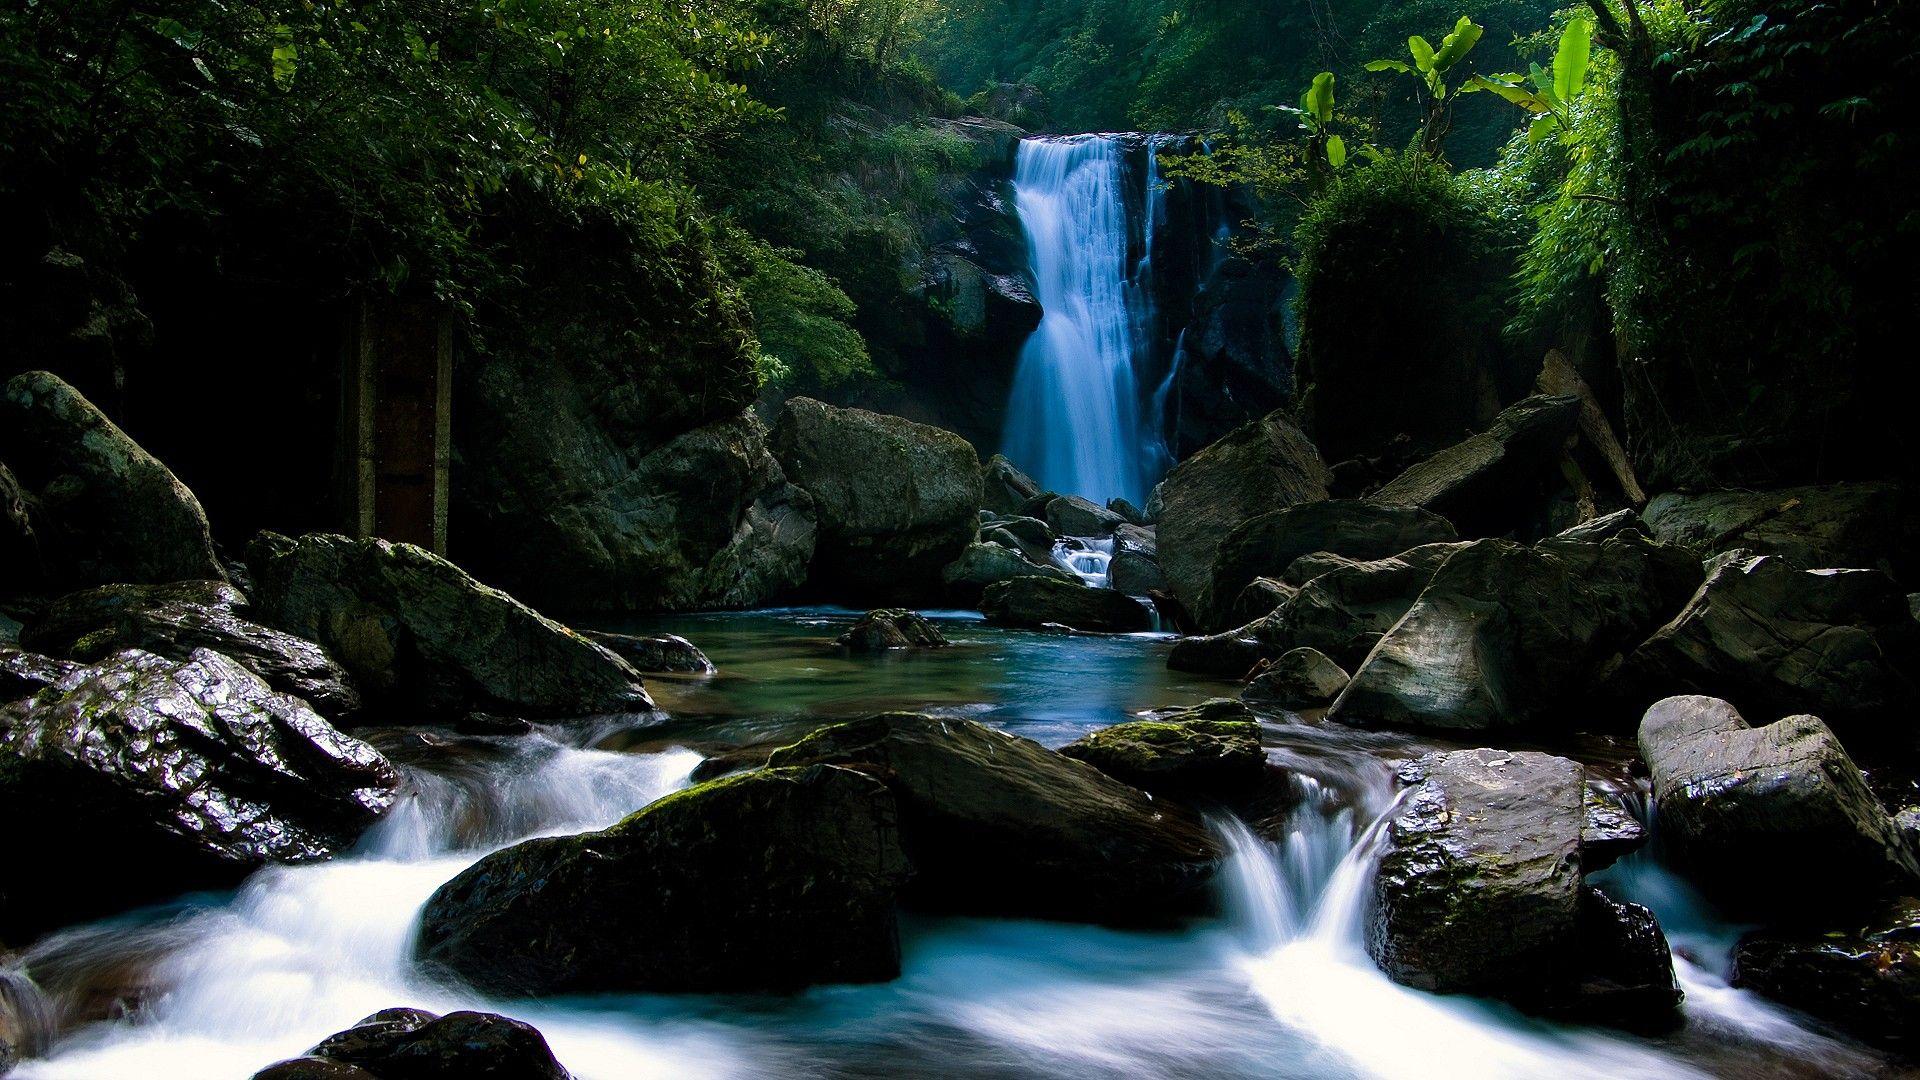 Simple Wallpaper Mobile Waterfall - e4eee10dd81a0a1330b40a76f85f4eb2  Snapshot_42398.jpg